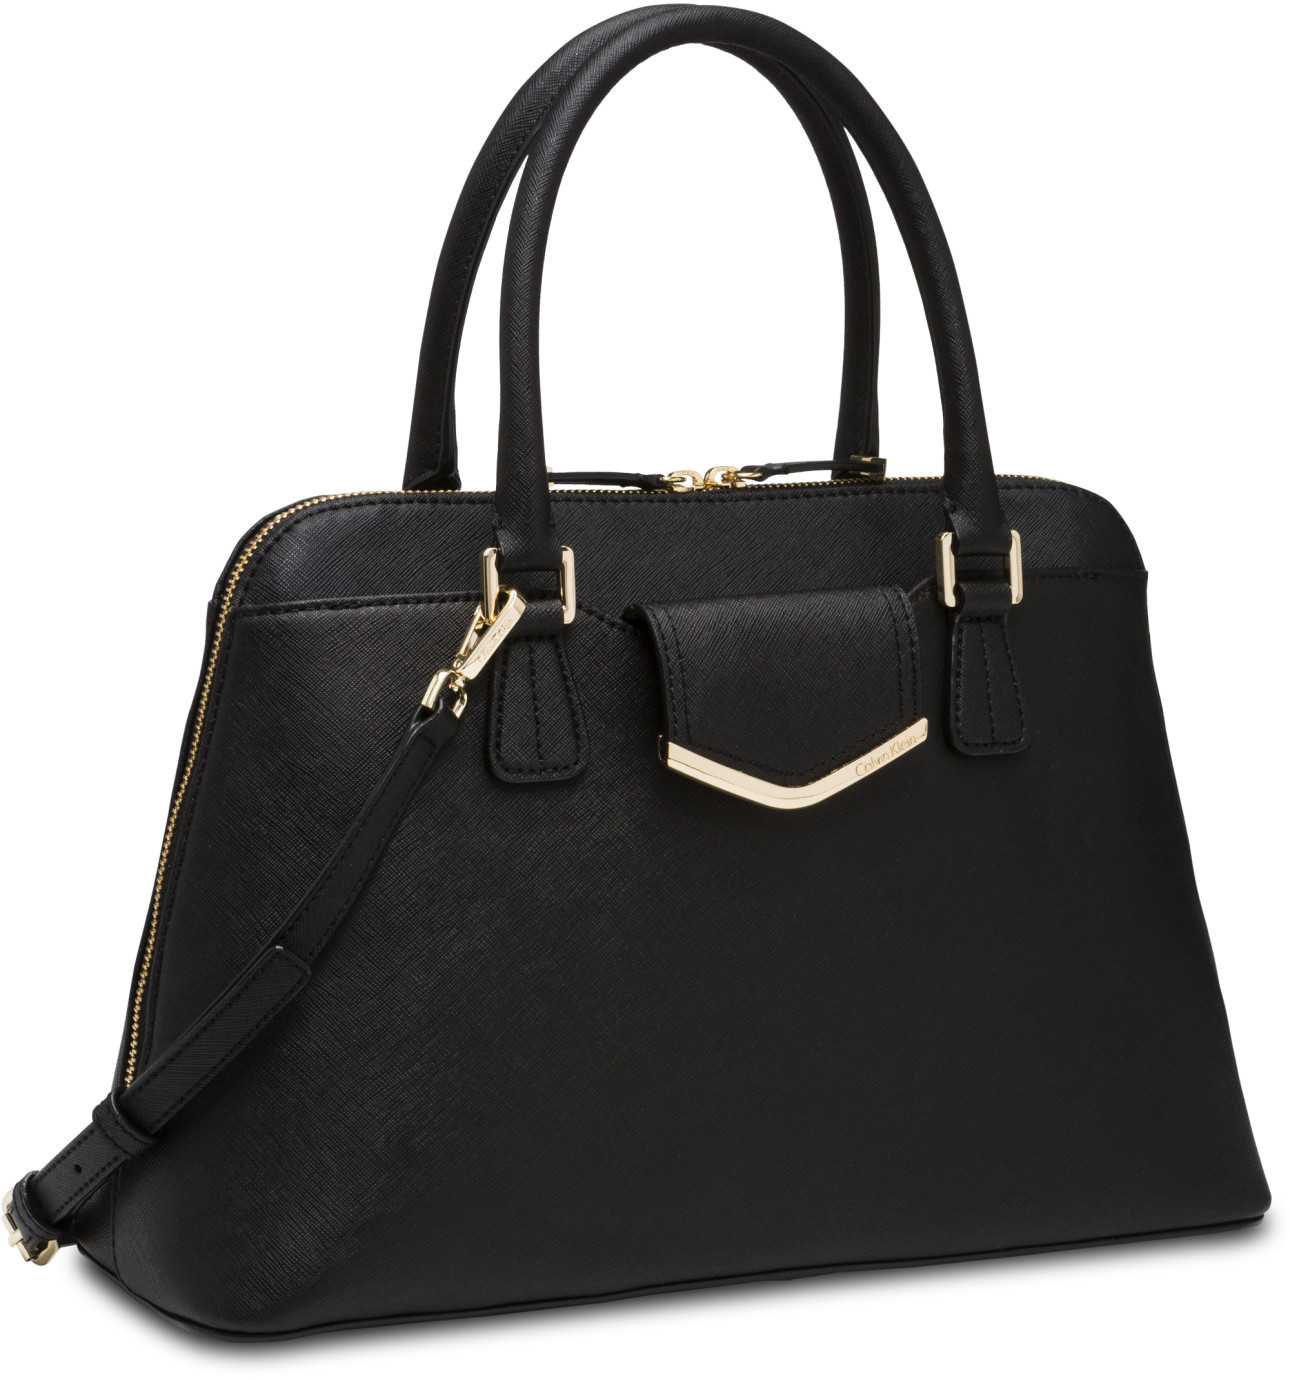 Calvin Klein Handbags Australia 2018